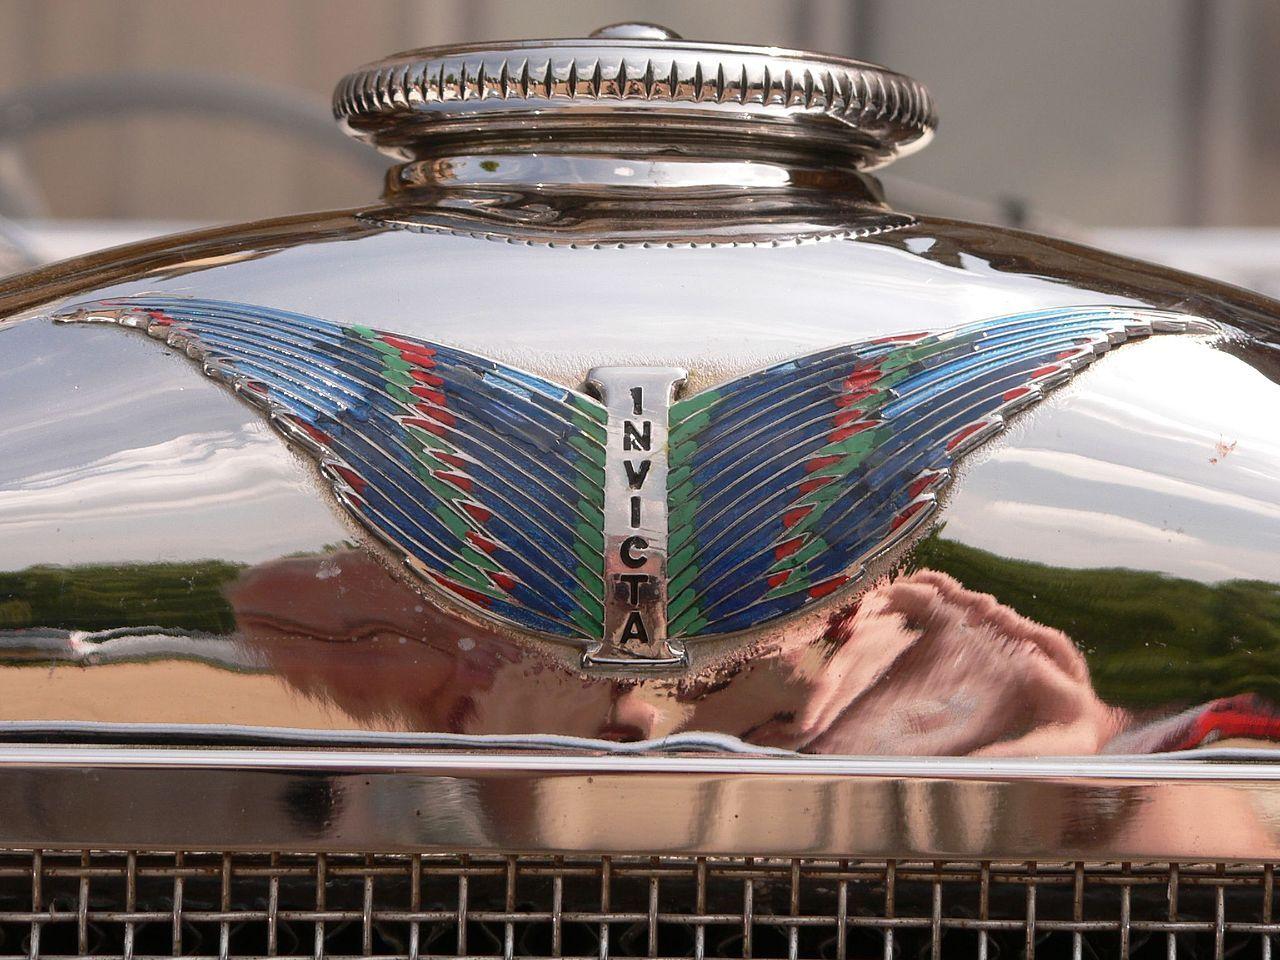 Pin On Invicta And Standard English Automobiles